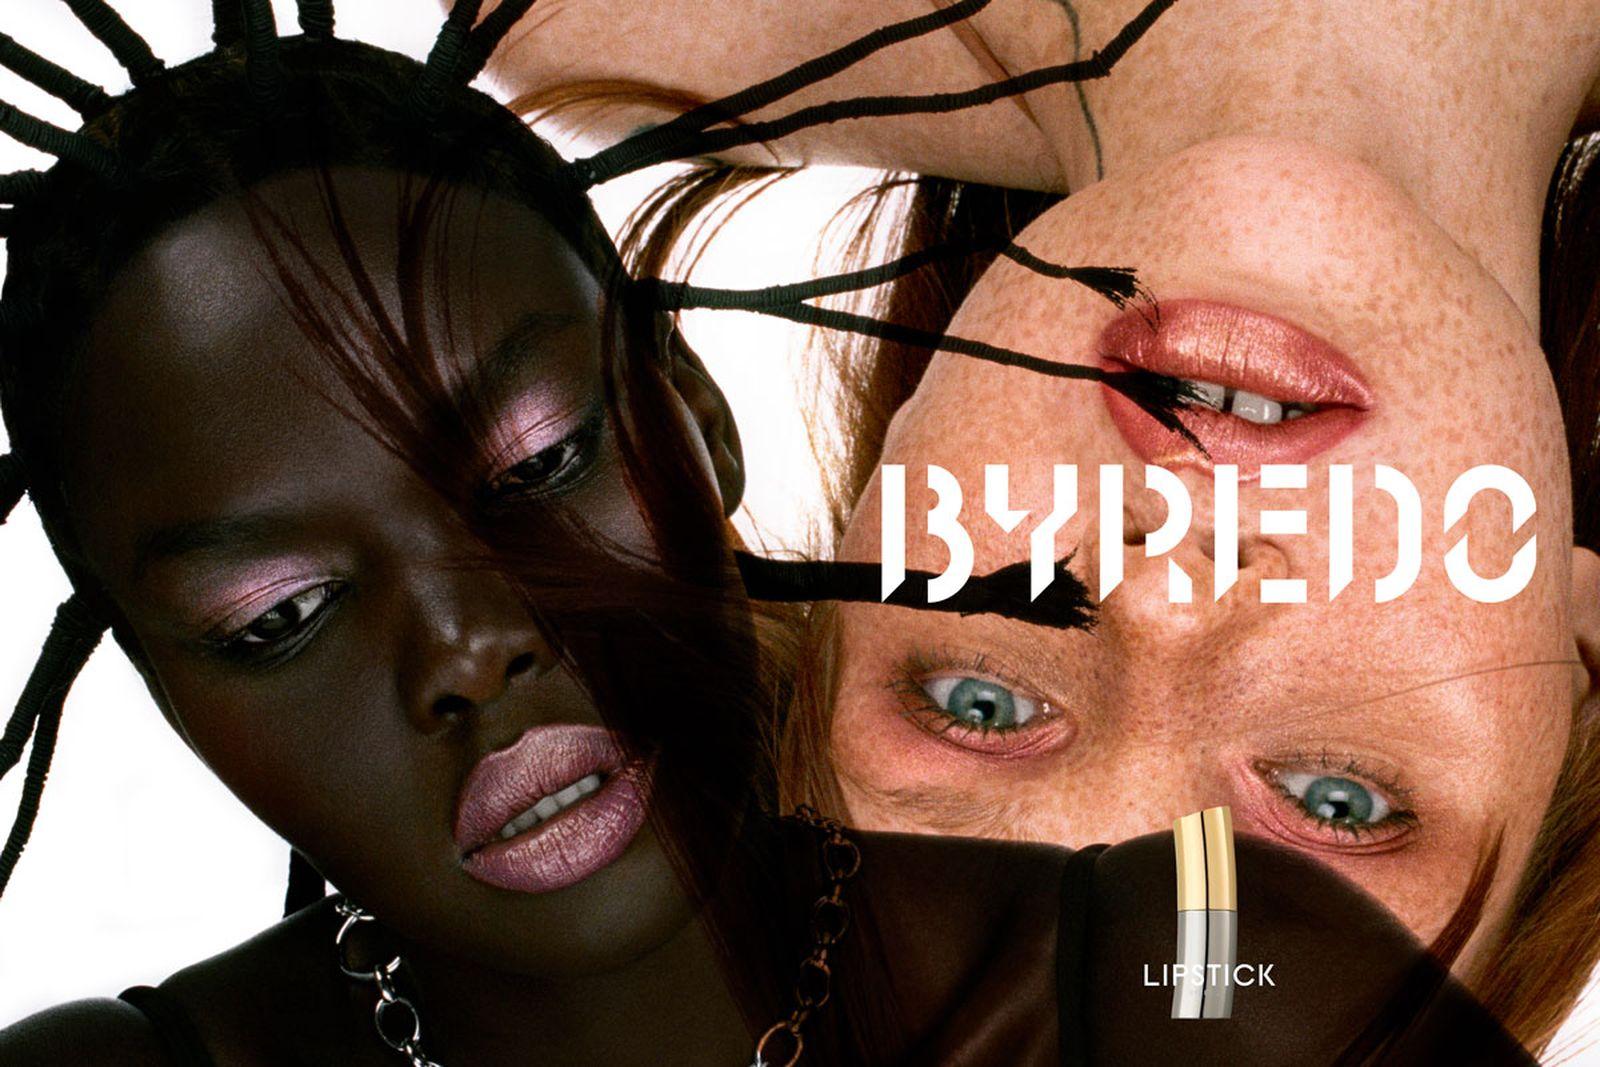 byredo-shimmering-nudes-lipstick-01